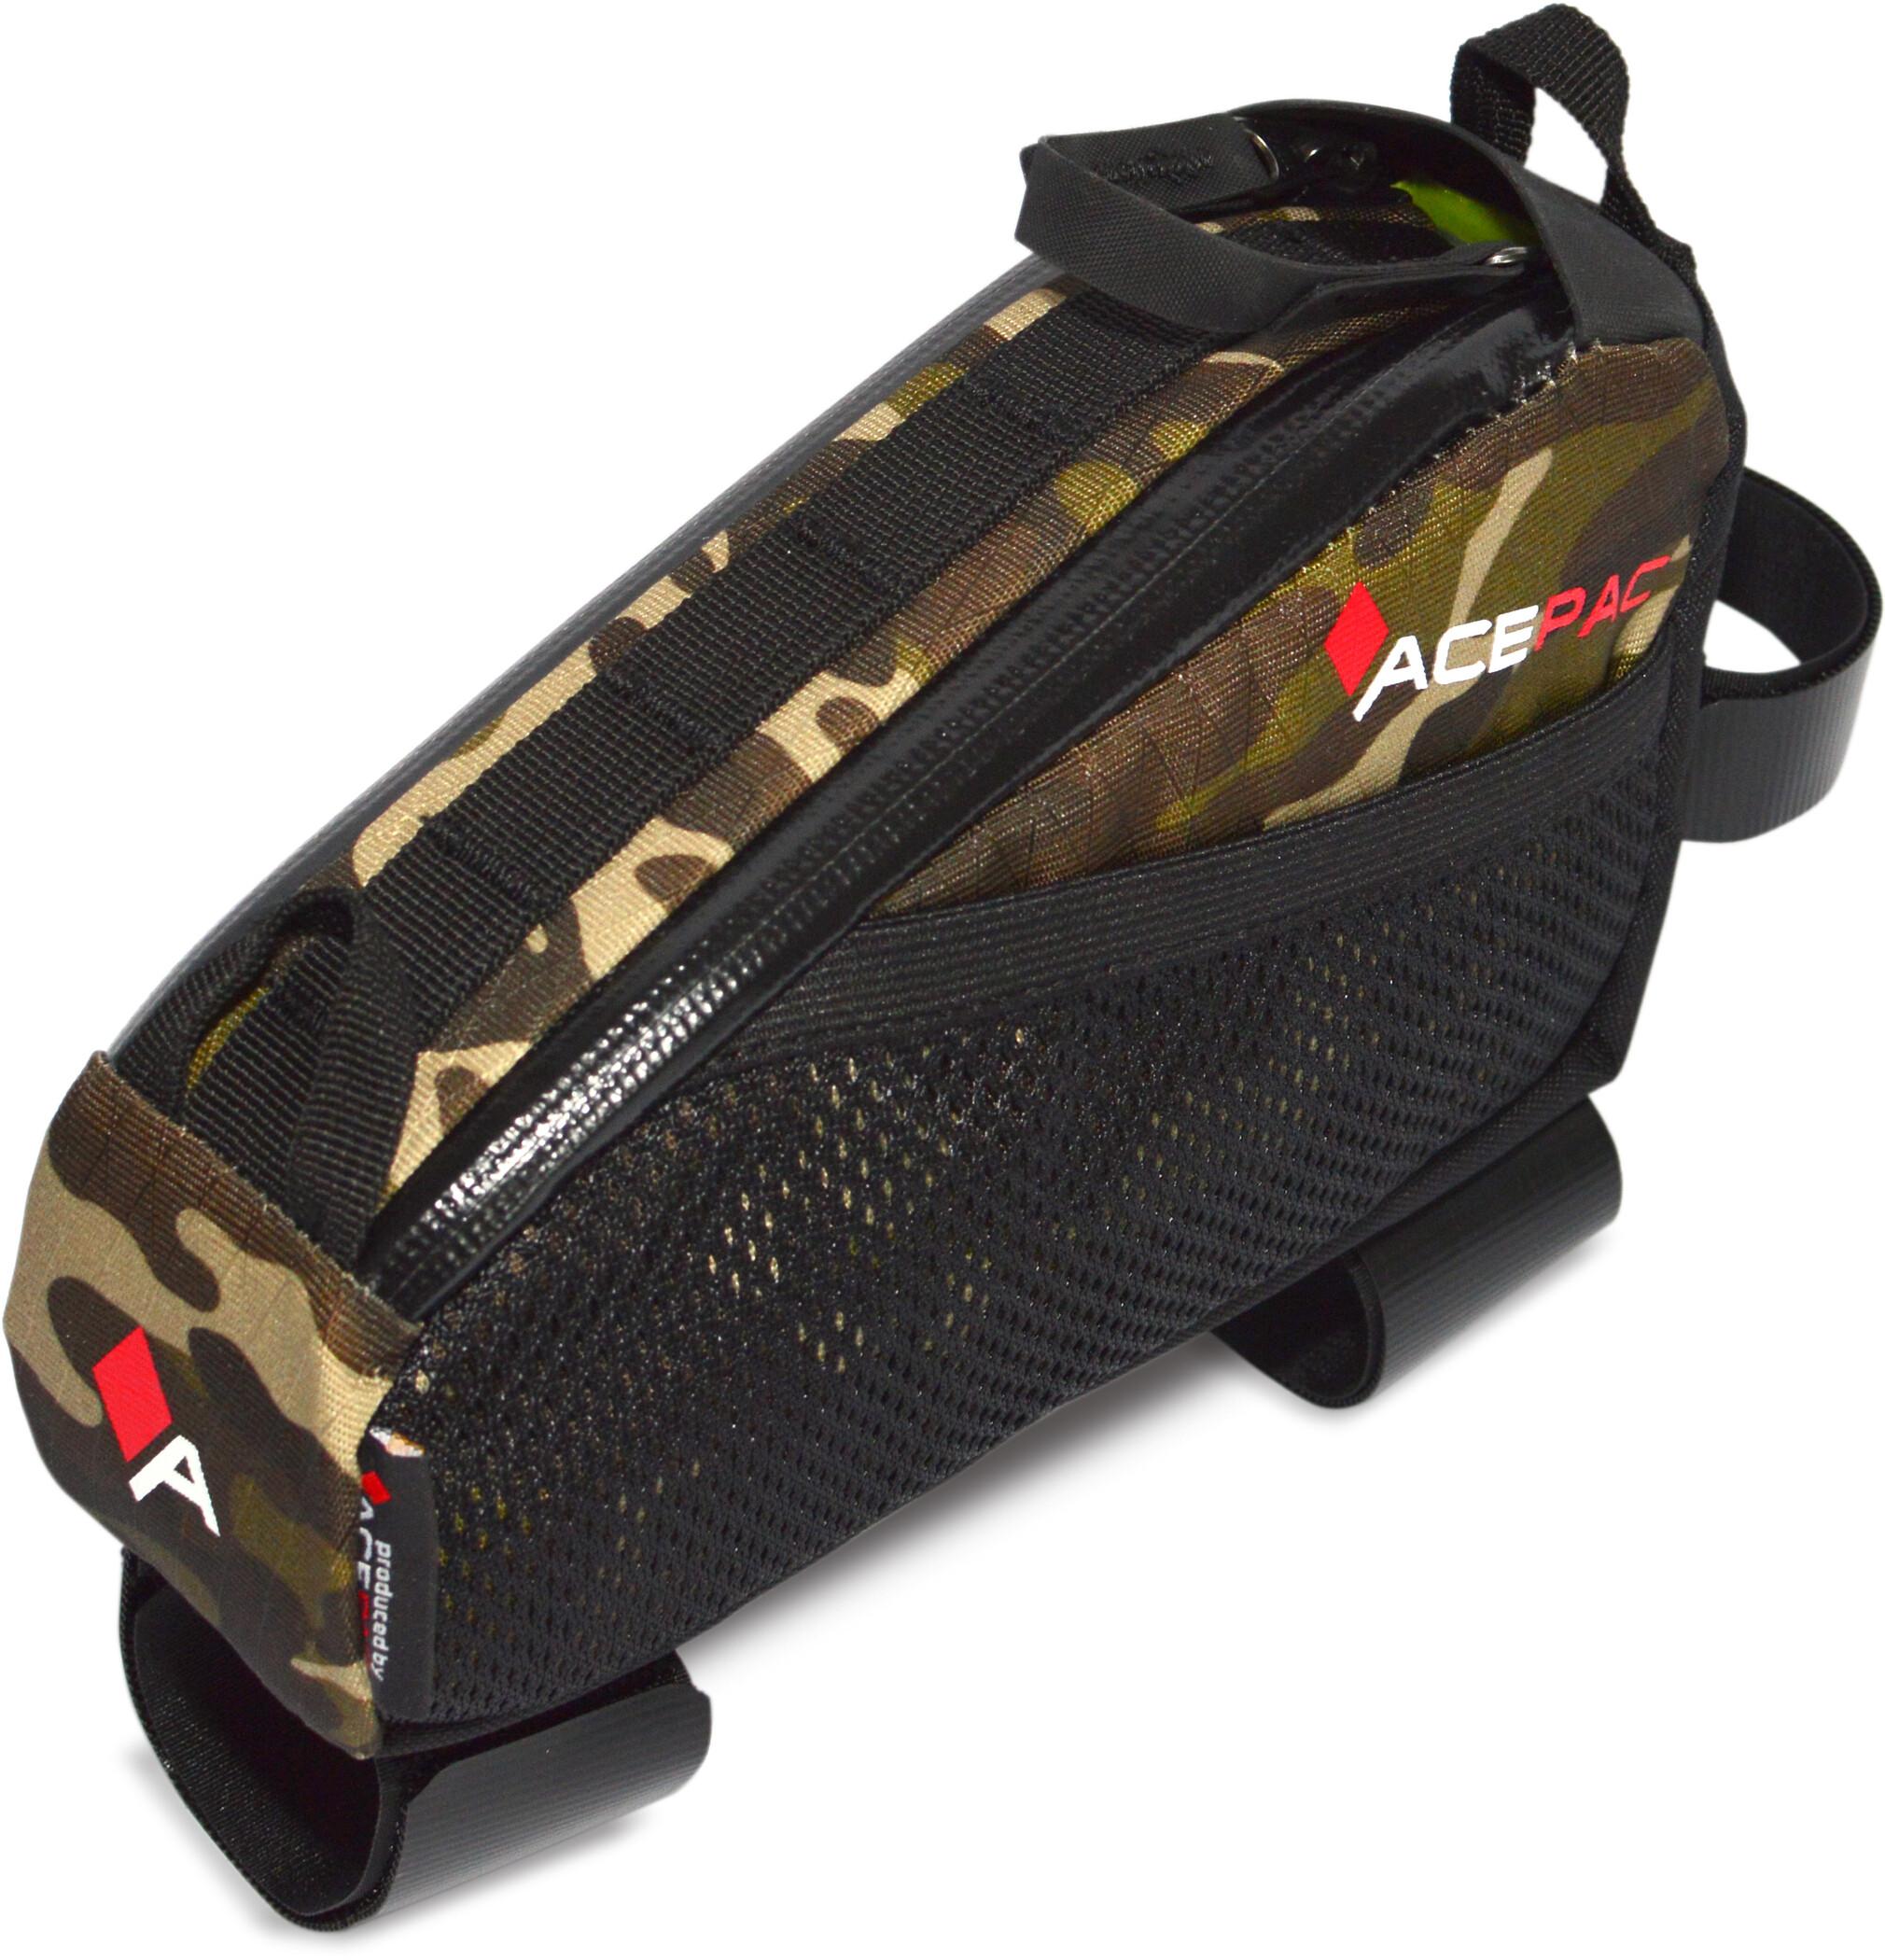 Acepac Fuel Cykeltaske M, camo (2019)   Frame bags